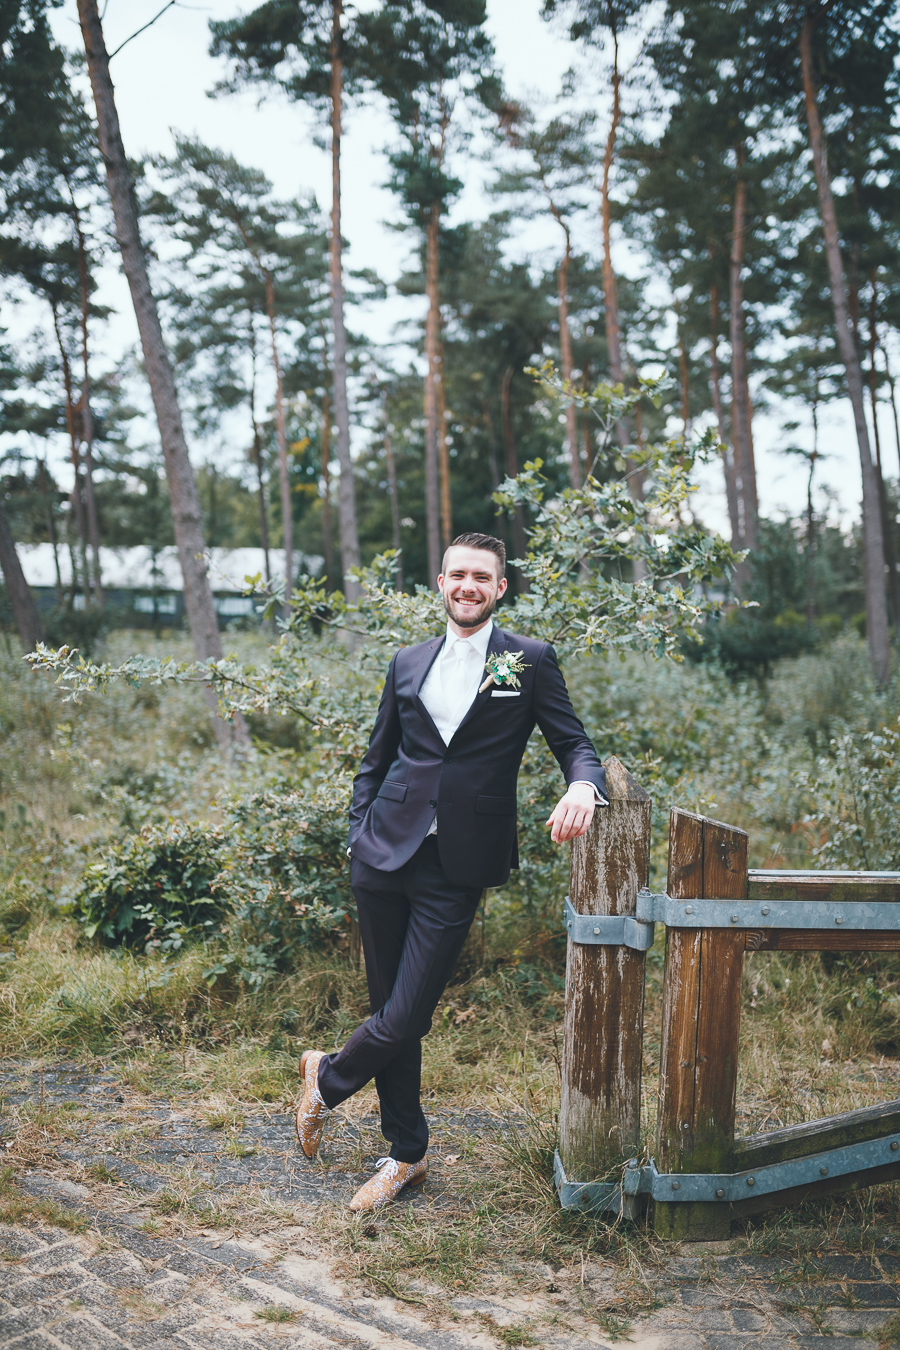 Trouwfotograaf bruidegom in bruin pak in groene omgeving Radio Kootwijk